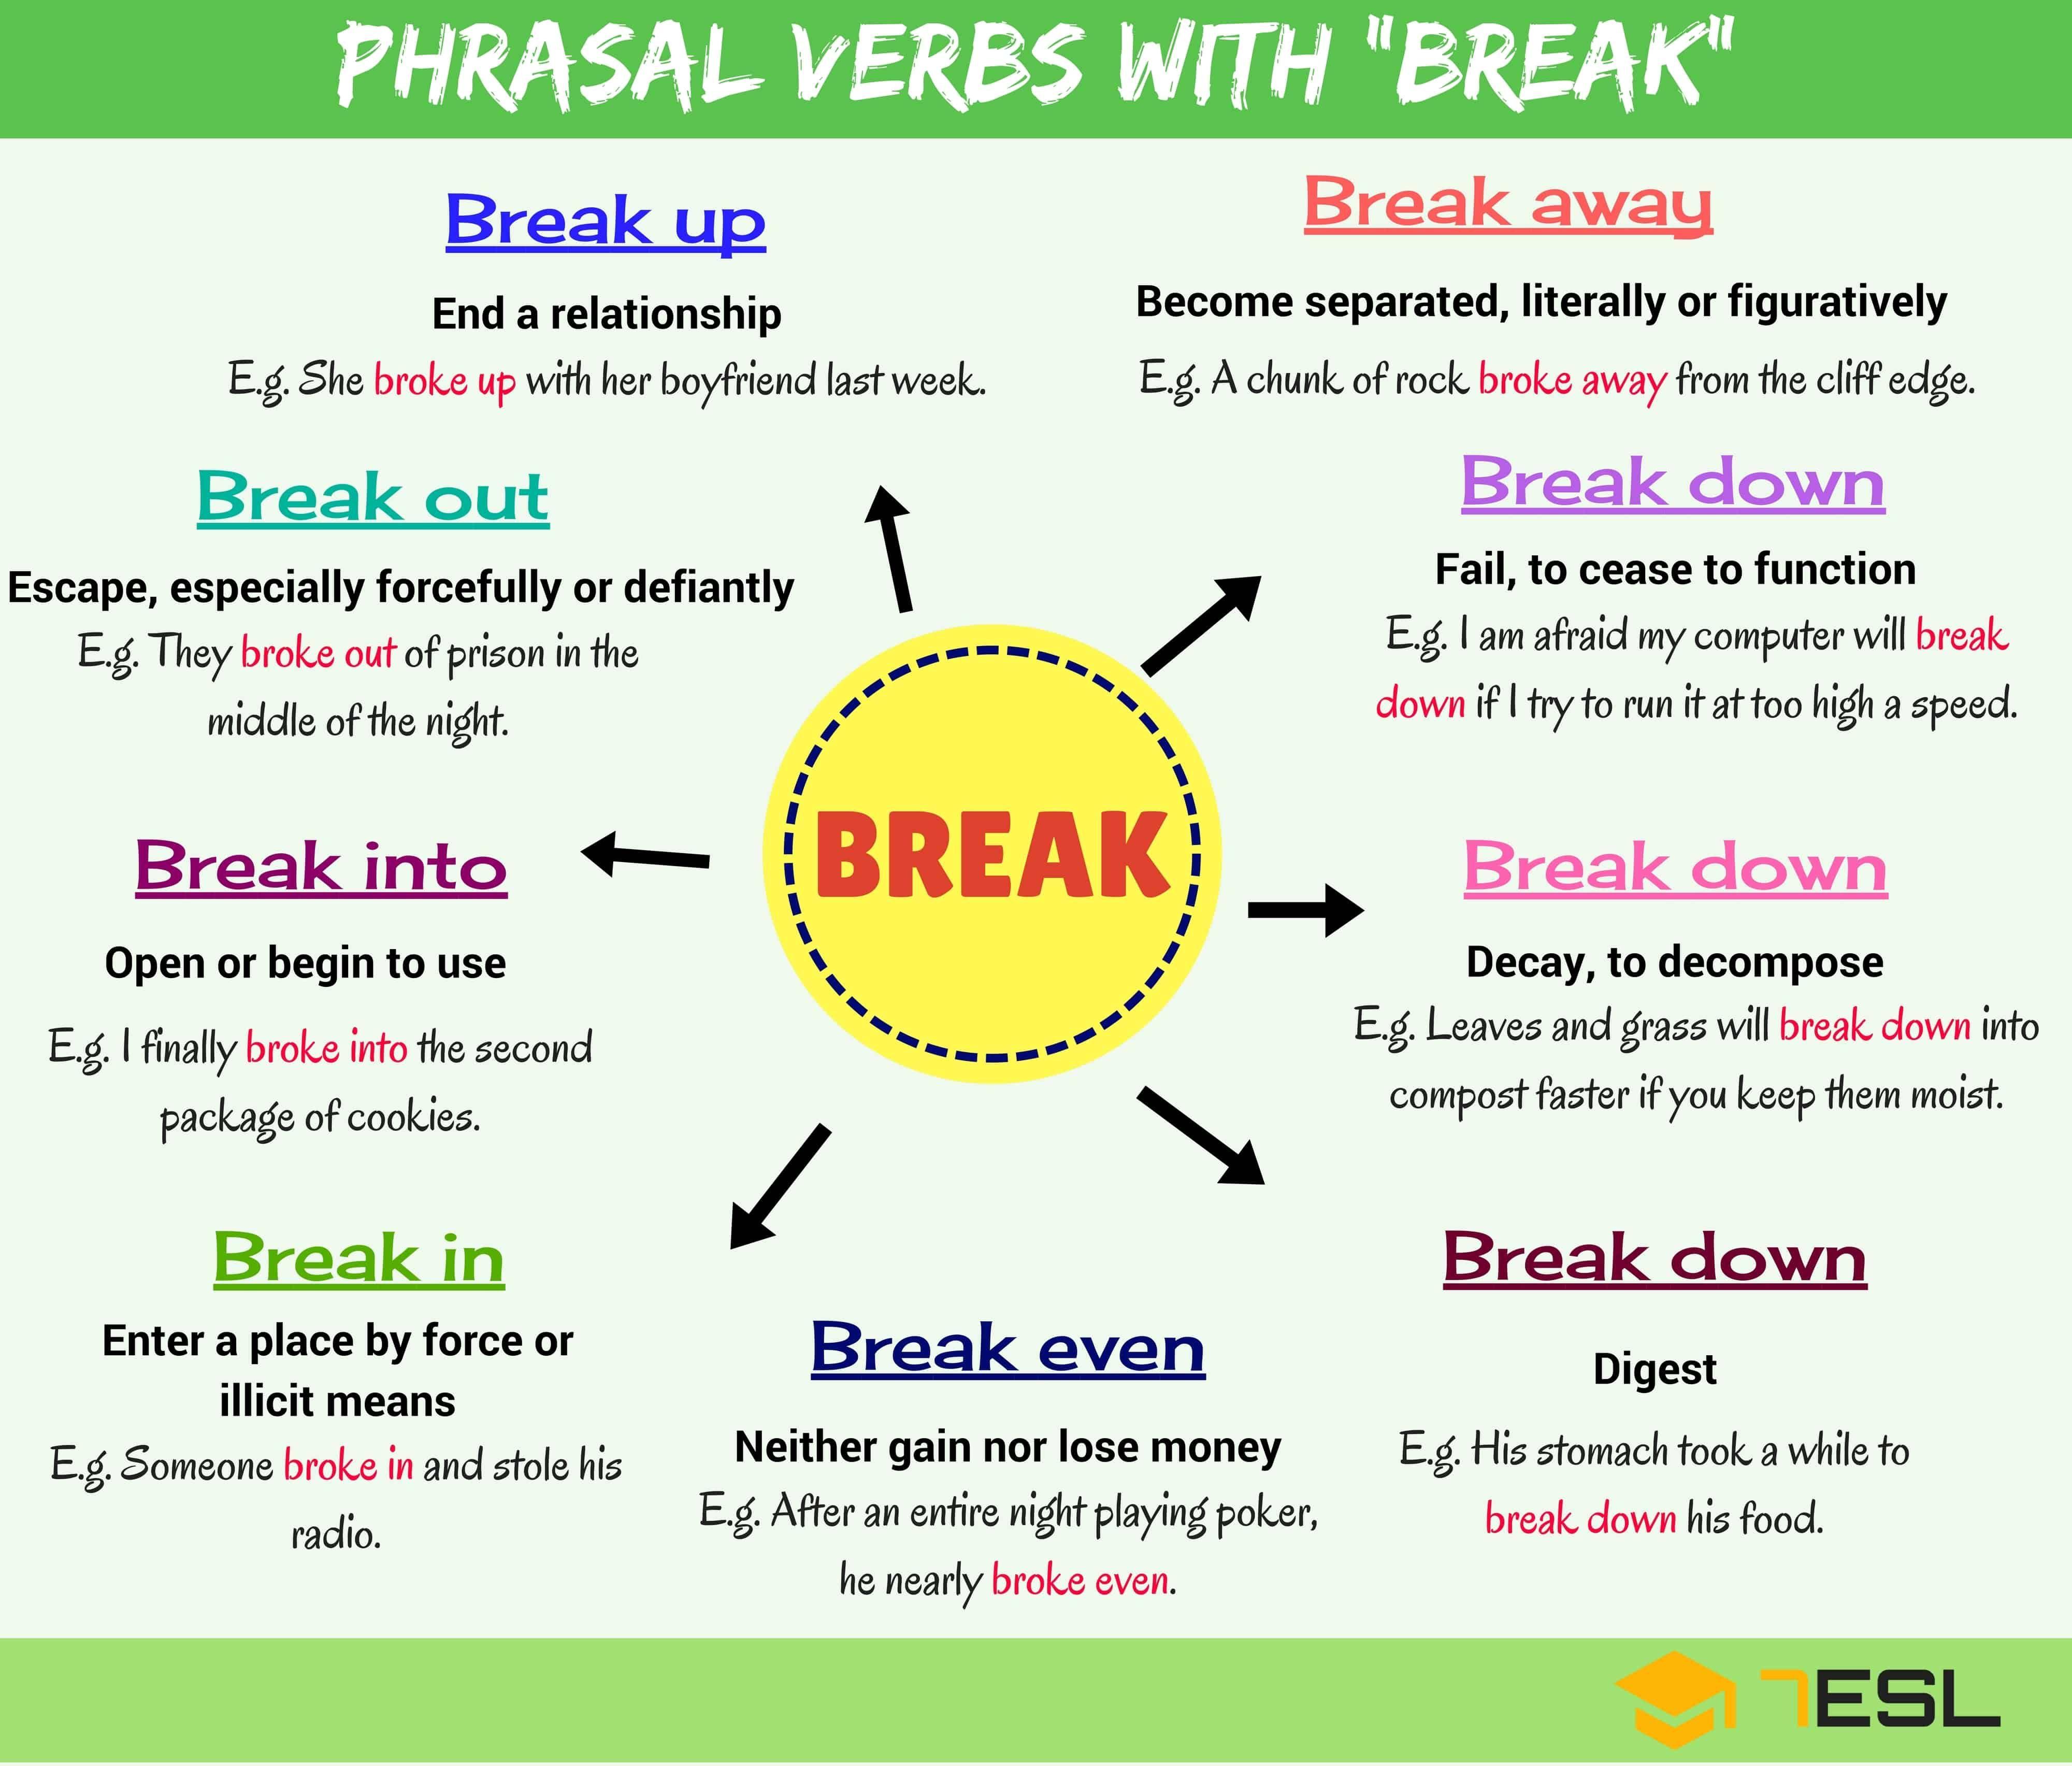 2000 Phrasal Verbs List From A Z To Sound Like A Native 7esl English Verbs Learn English Learn English Grammar [ 3409 x 4000 Pixel ]